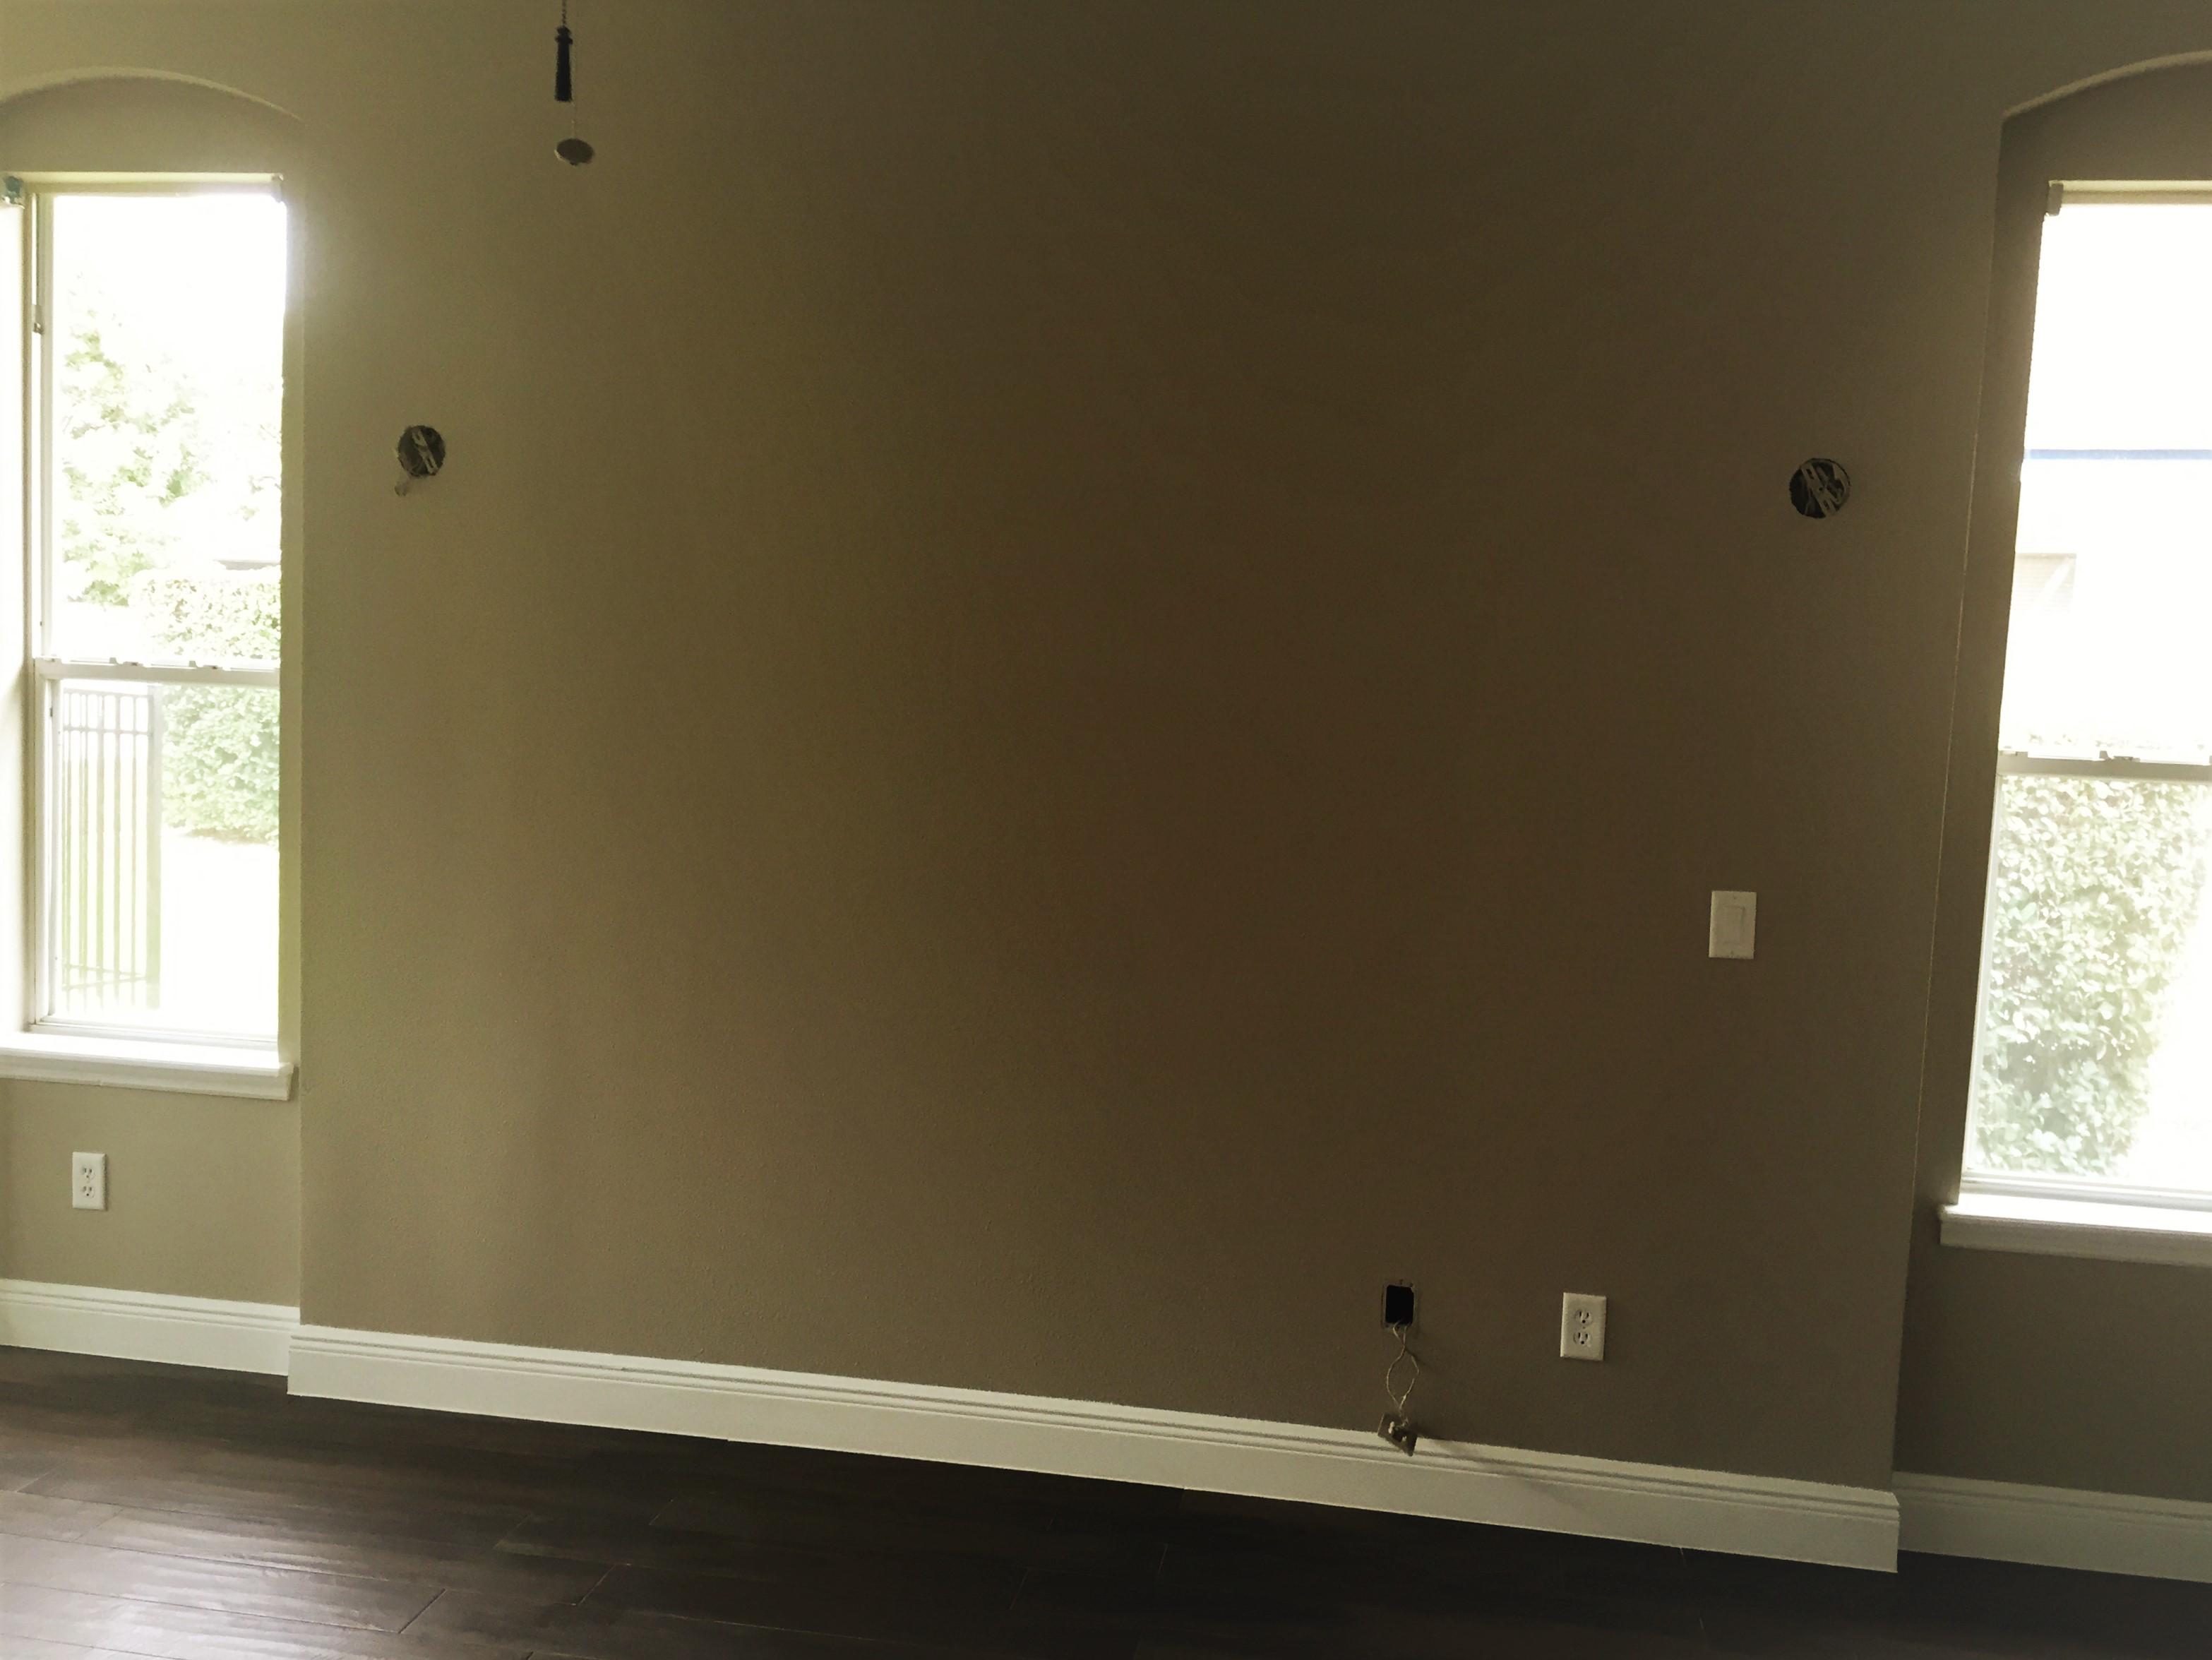 New drywall wall